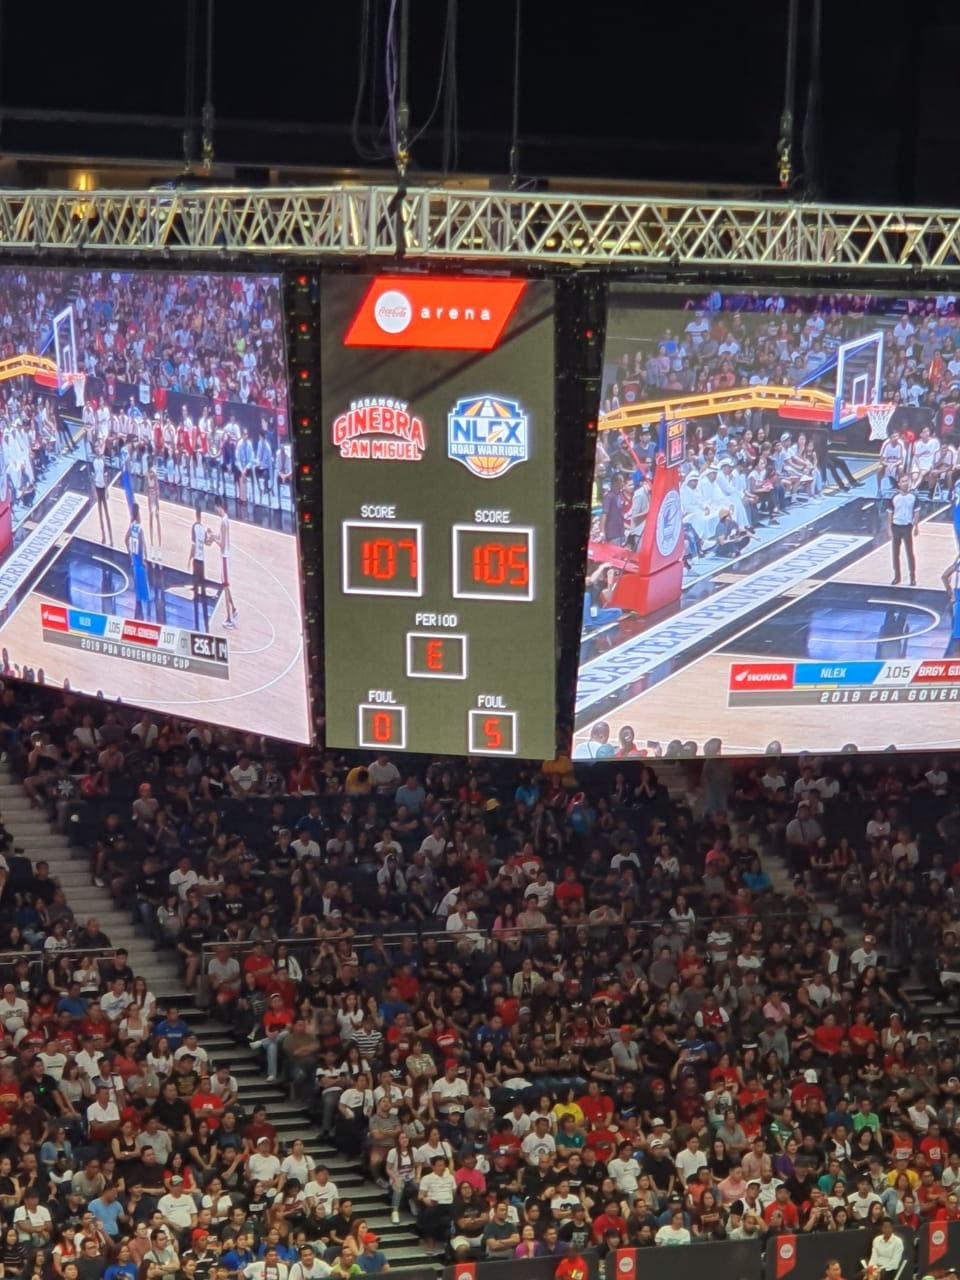 NLEX vs Ginebra at Coca Cola Arena in Dubai on October 5, 2019.